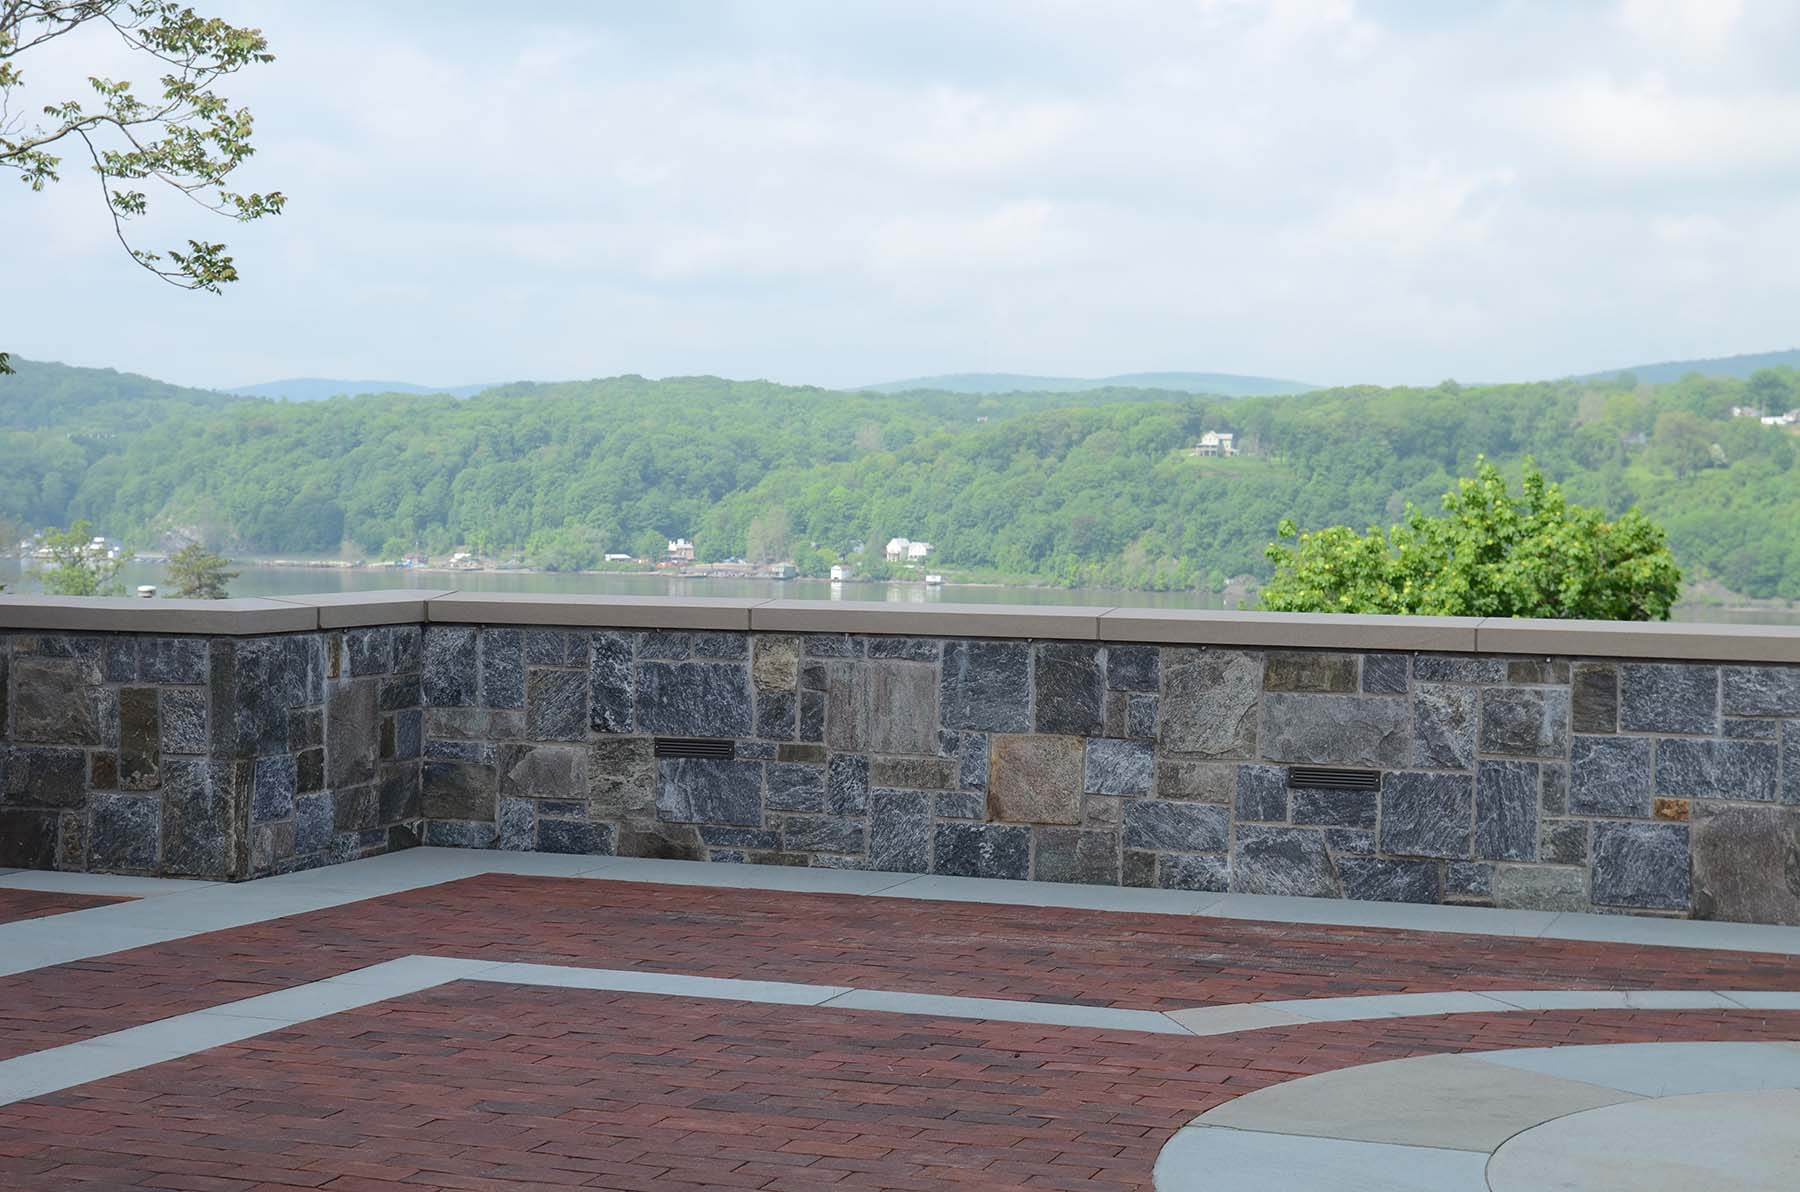 Ticonderoga granite natural stone wall in park overlooking lake